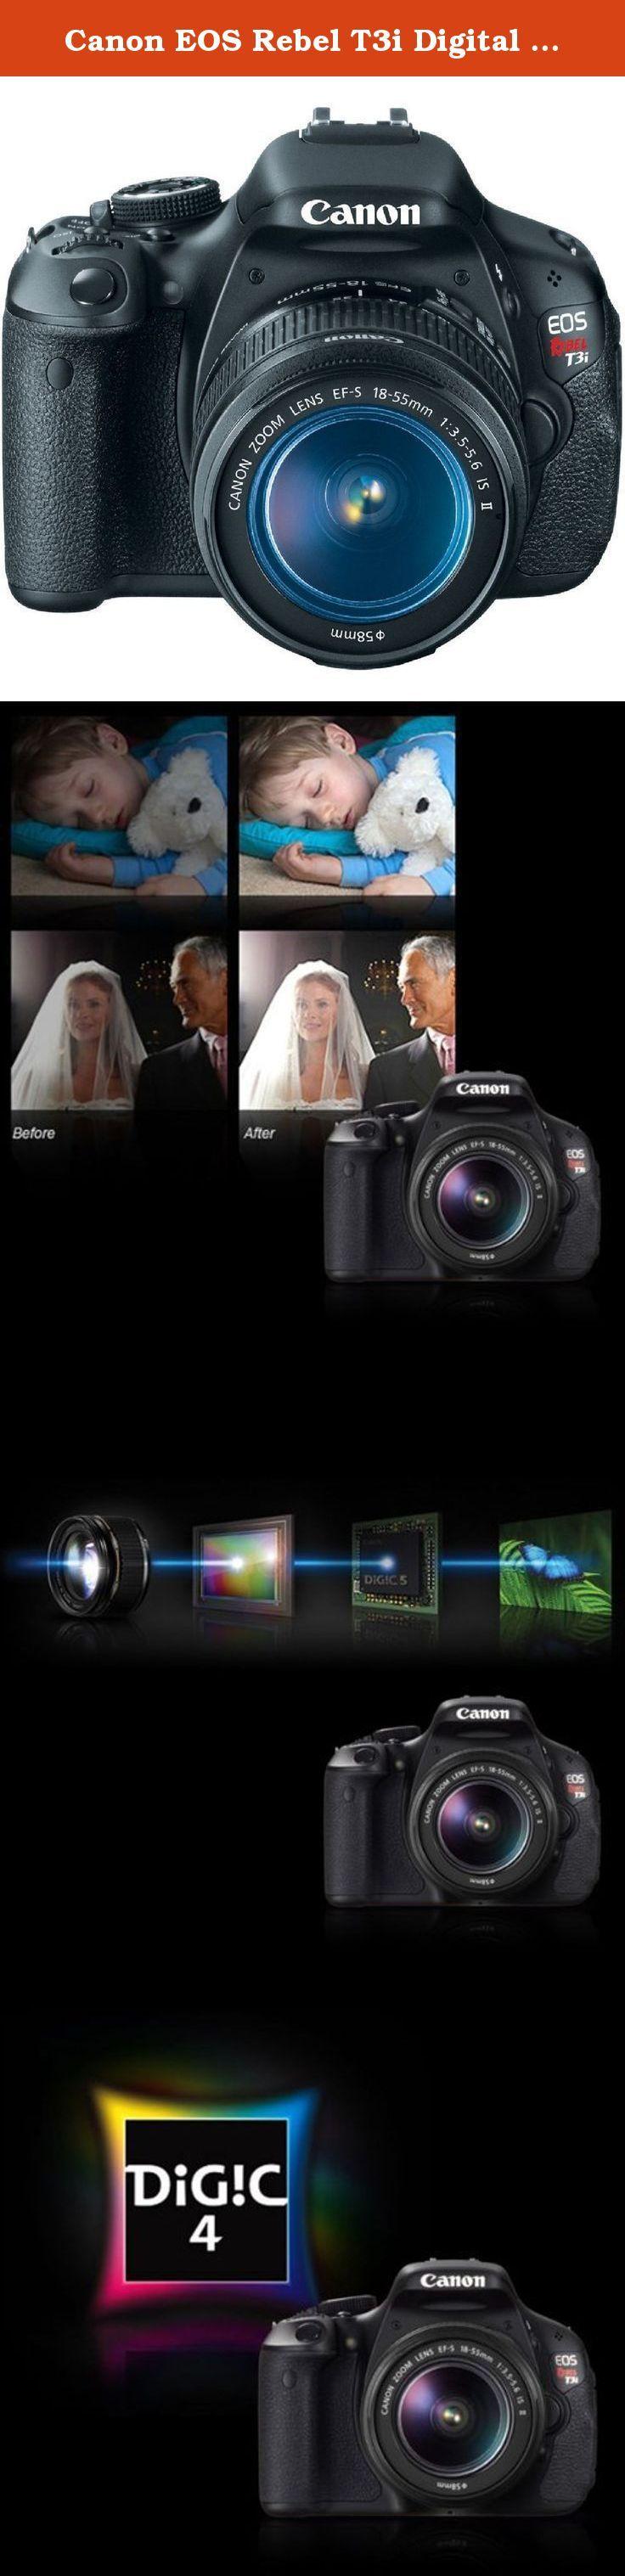 Canon EOS Rebel T3i Digital SLR Camera with EF-S 18-55mm f/3.5-5.6 ...